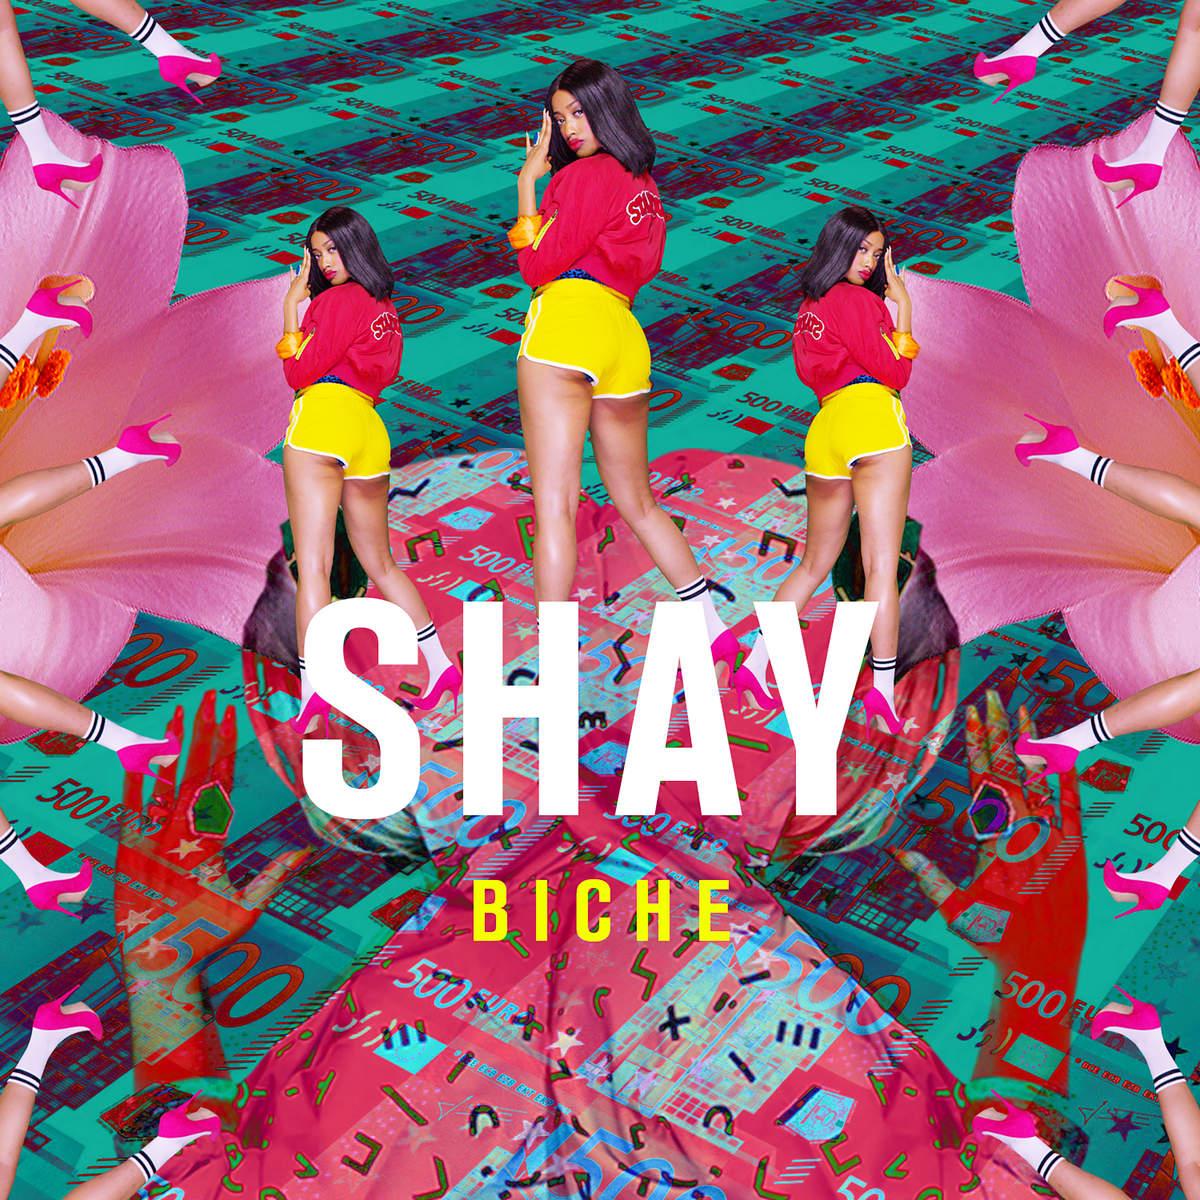 ich liebe dich shay